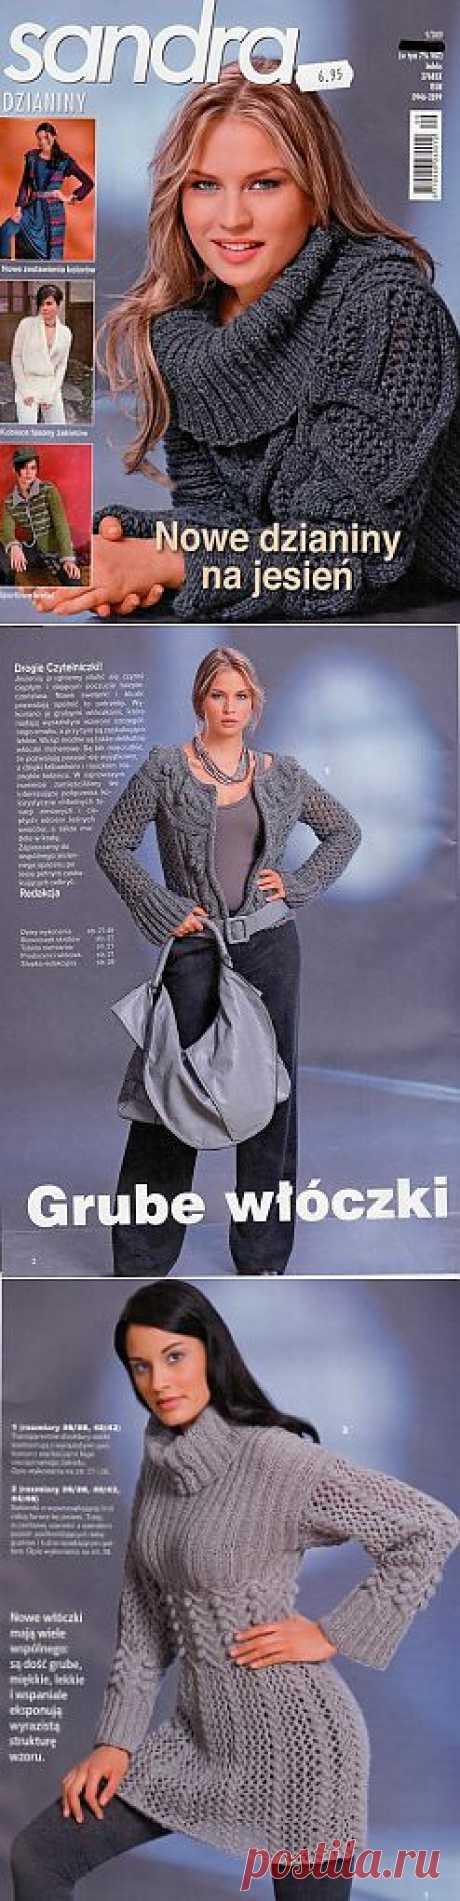 Вязание. Sandra dzianiny №9 2009.